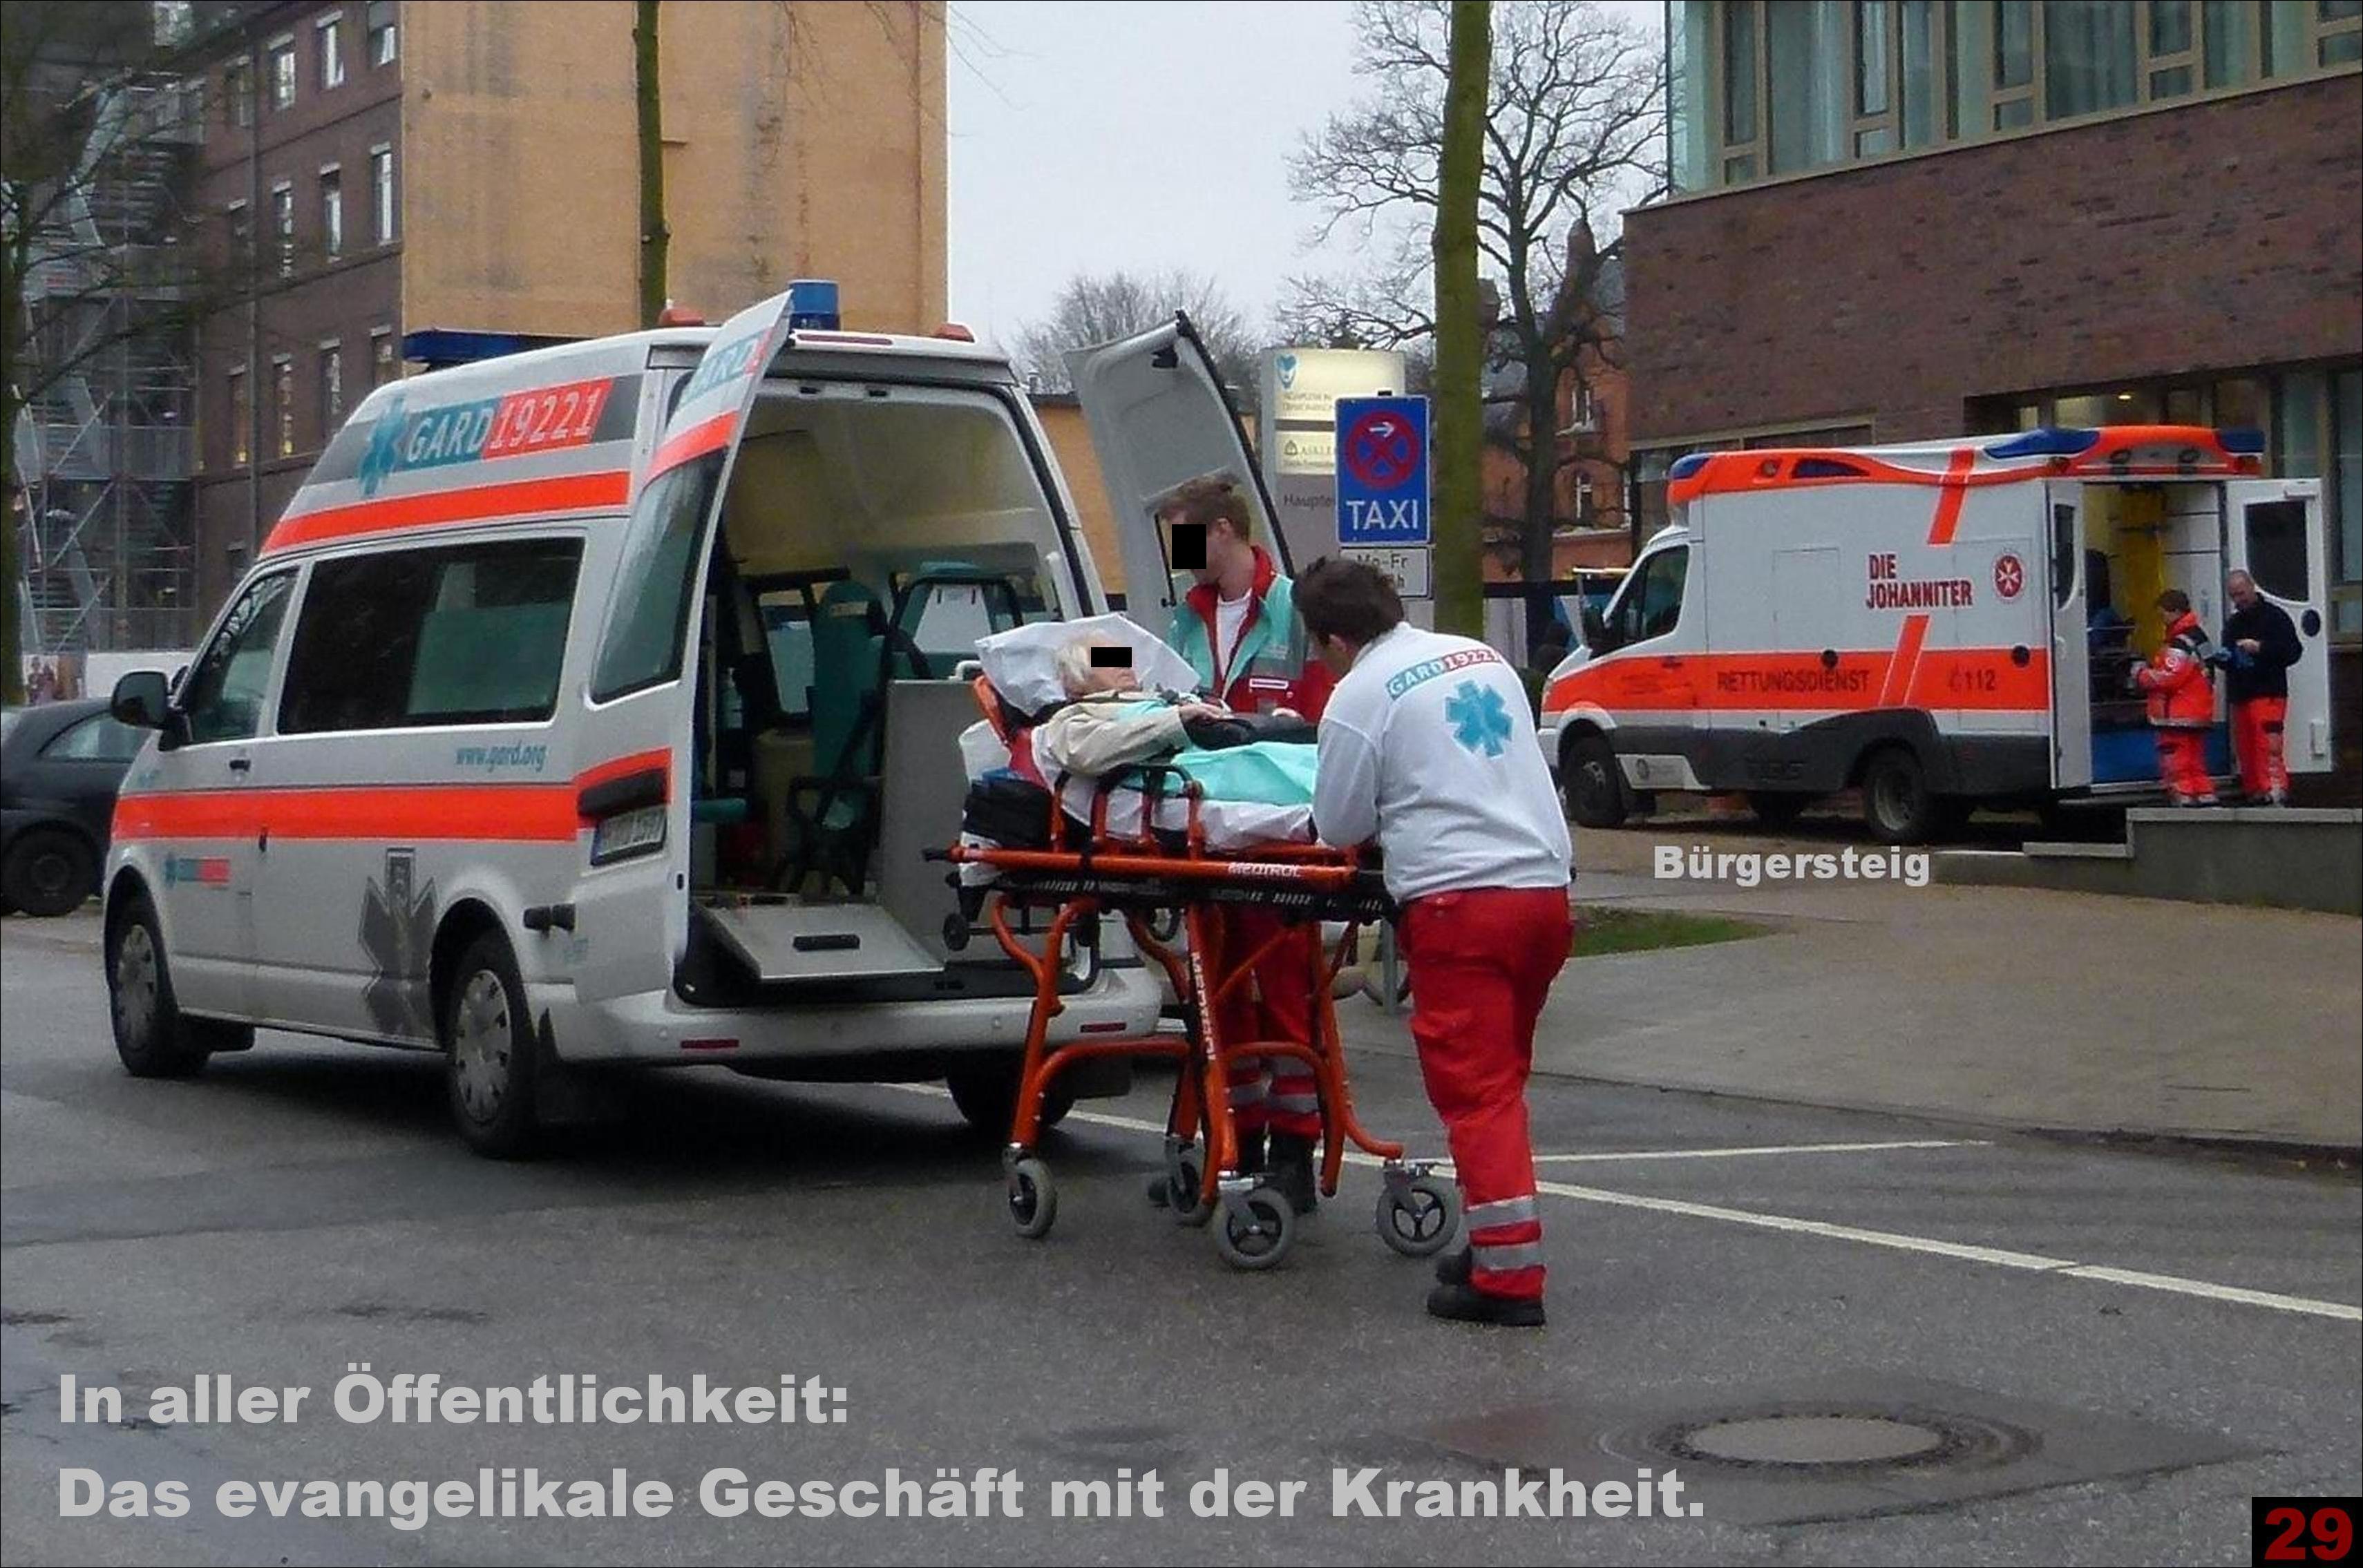 Diakonieklinikum Hamburg